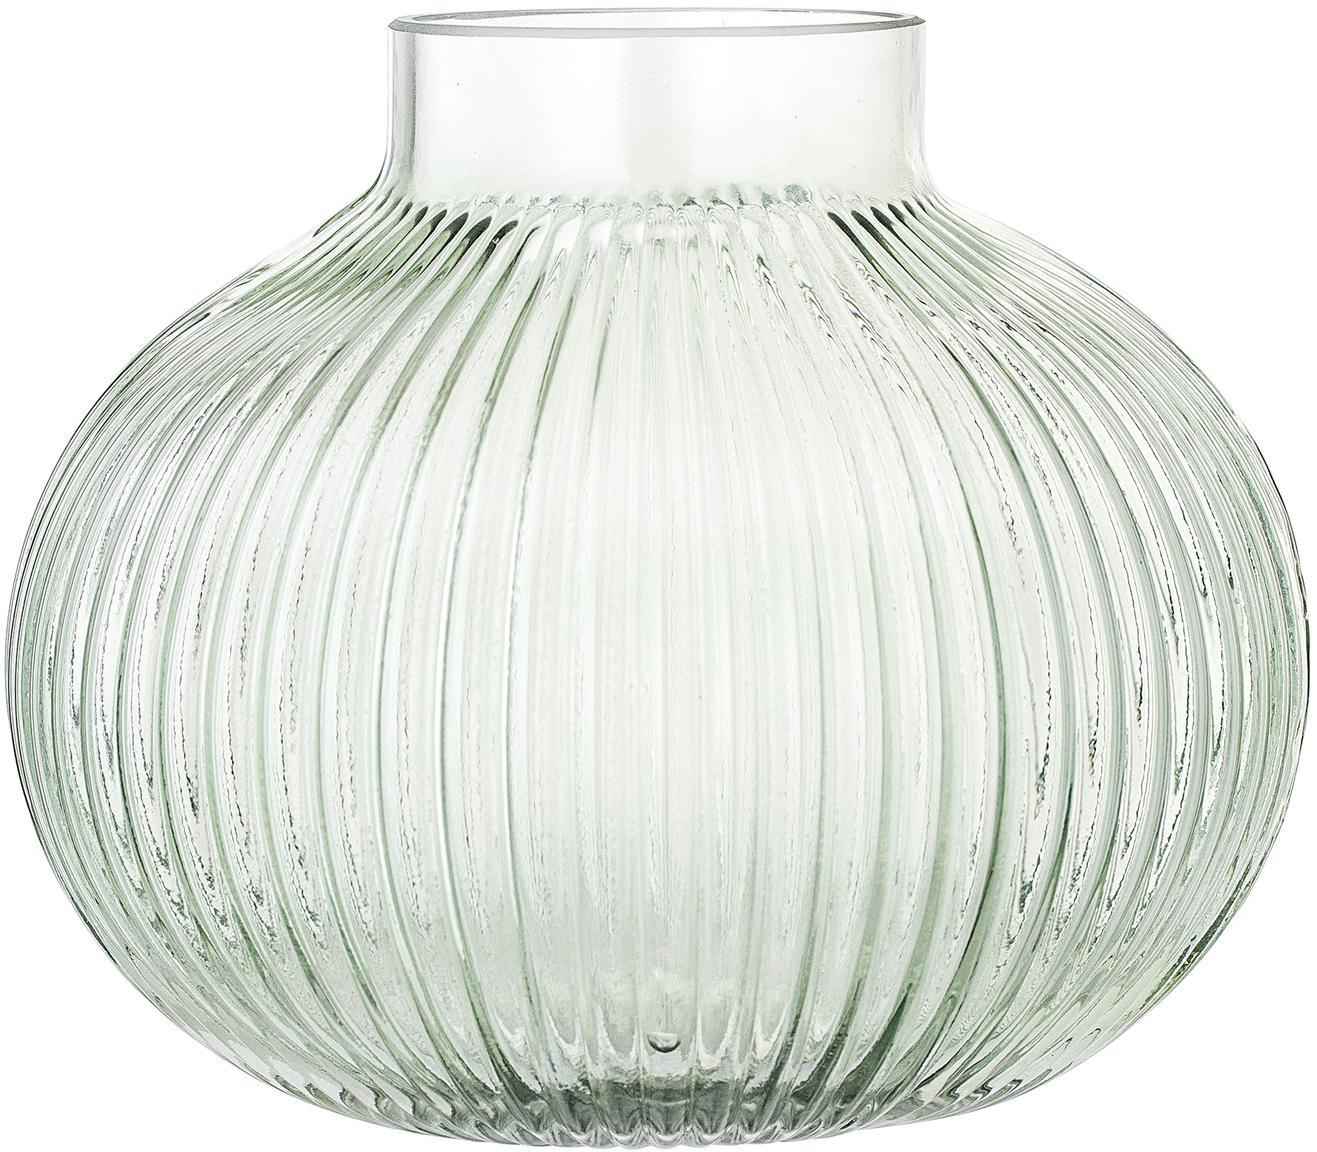 Vaso Gola, Vetro, Verde chiaro trasparente, Ø 16 x Alt. 15 cm